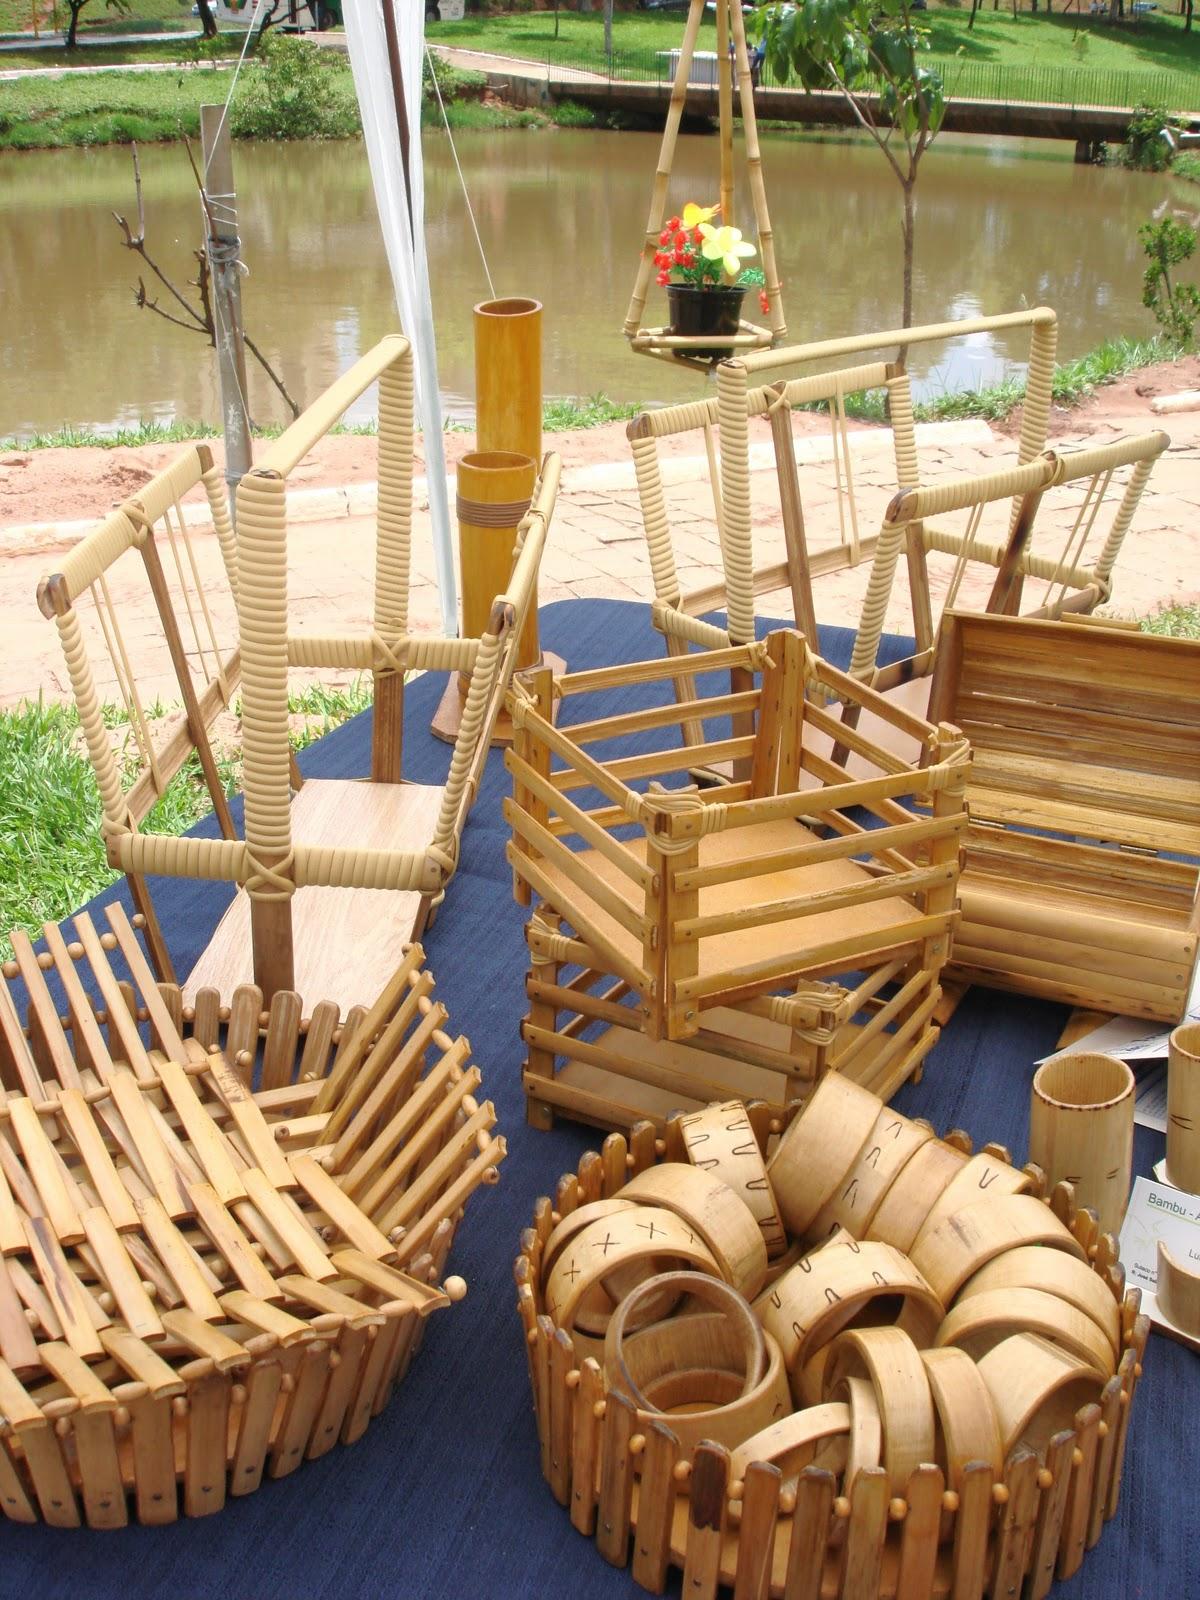 Artesanato Com Cd Velho ~ Feira UBÁ Bauru Bambu Artesanatos